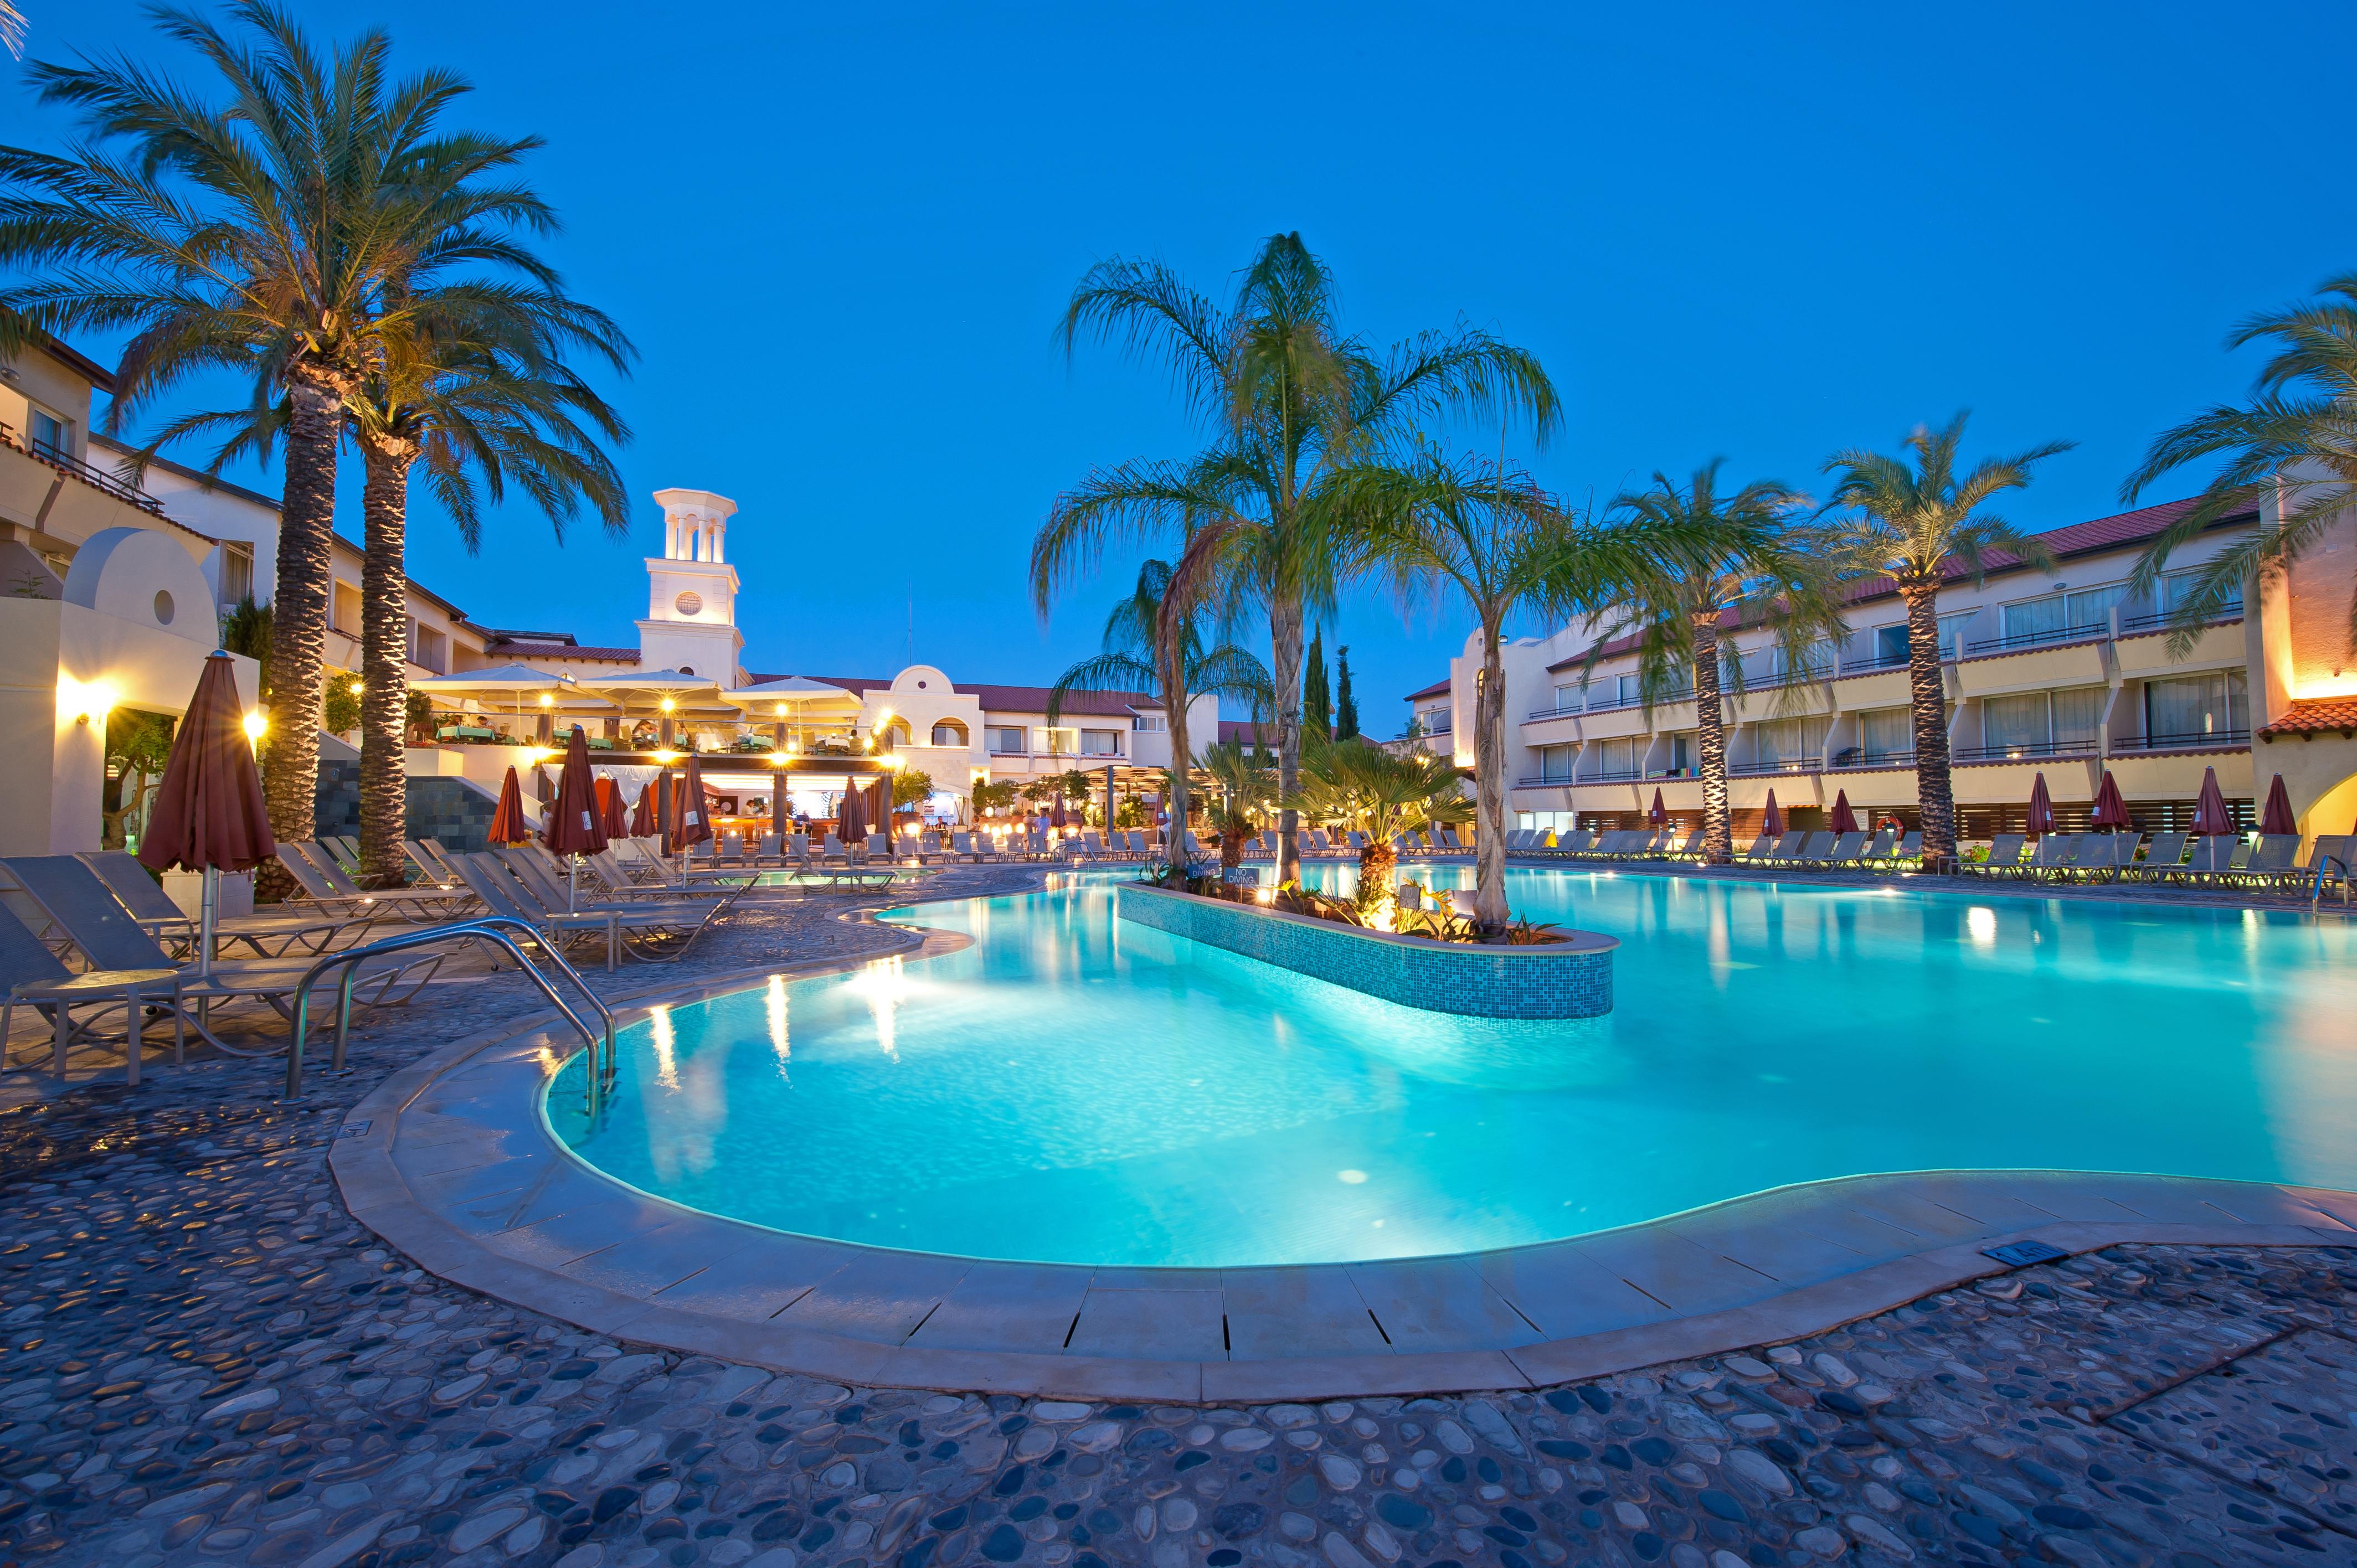 CYPR - LATO 2018: Napa Plaza Hotel****, 8 dni (07-14.05.2018 r.), śniadania: 1979,00 PLN/os. dorosła